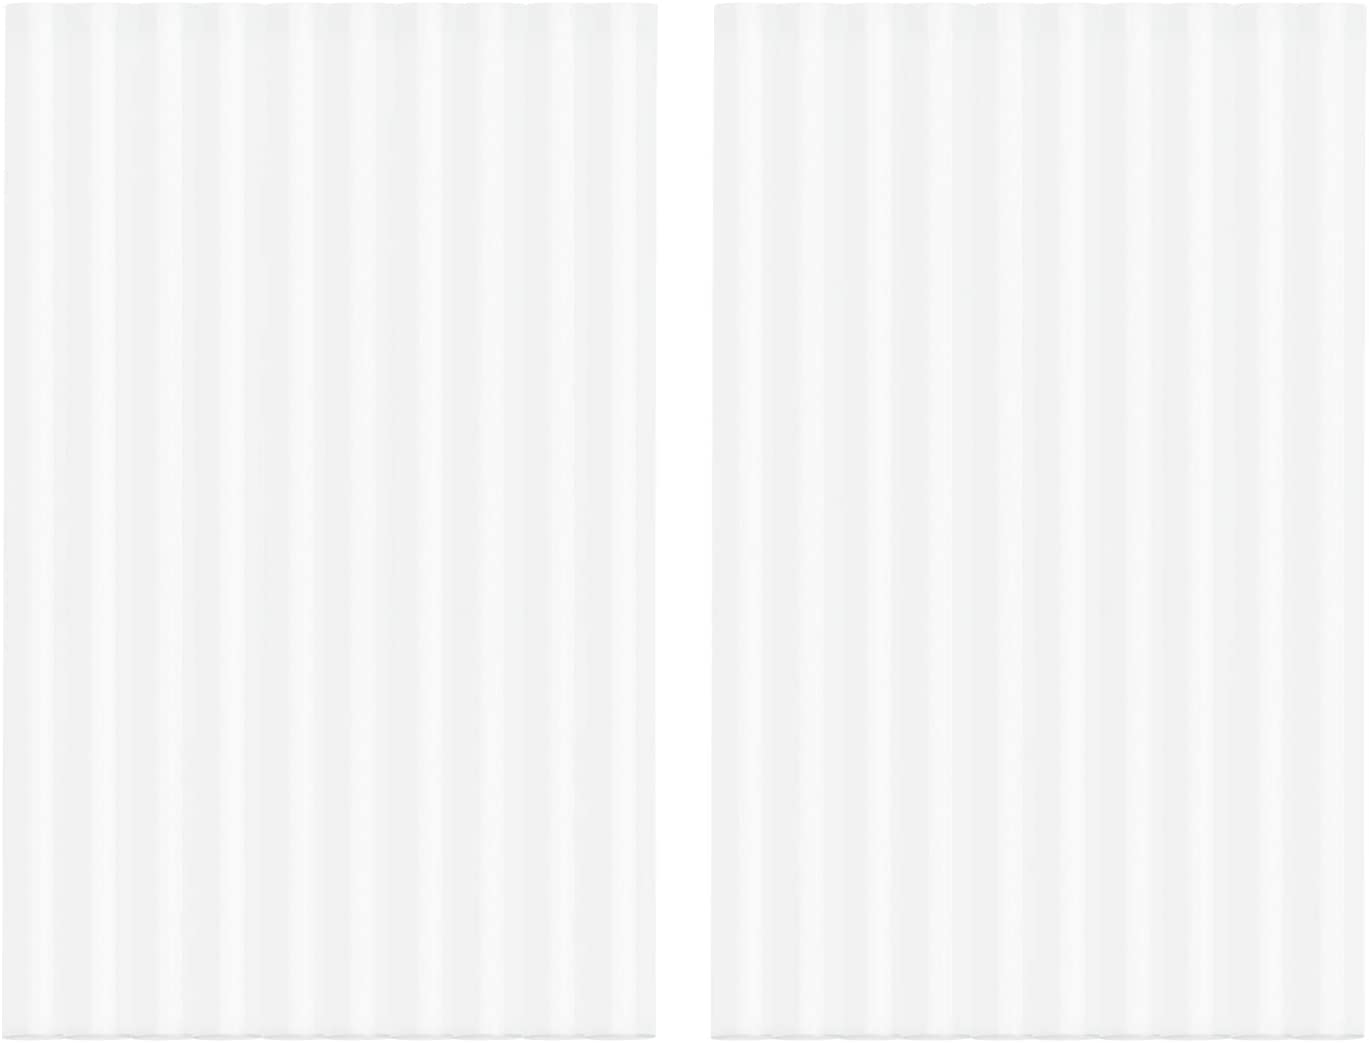 Klebesticks f/ür Hei/ßklebepistole Idena 60048 je 7,2 mm x 10 cm 20 St/ück